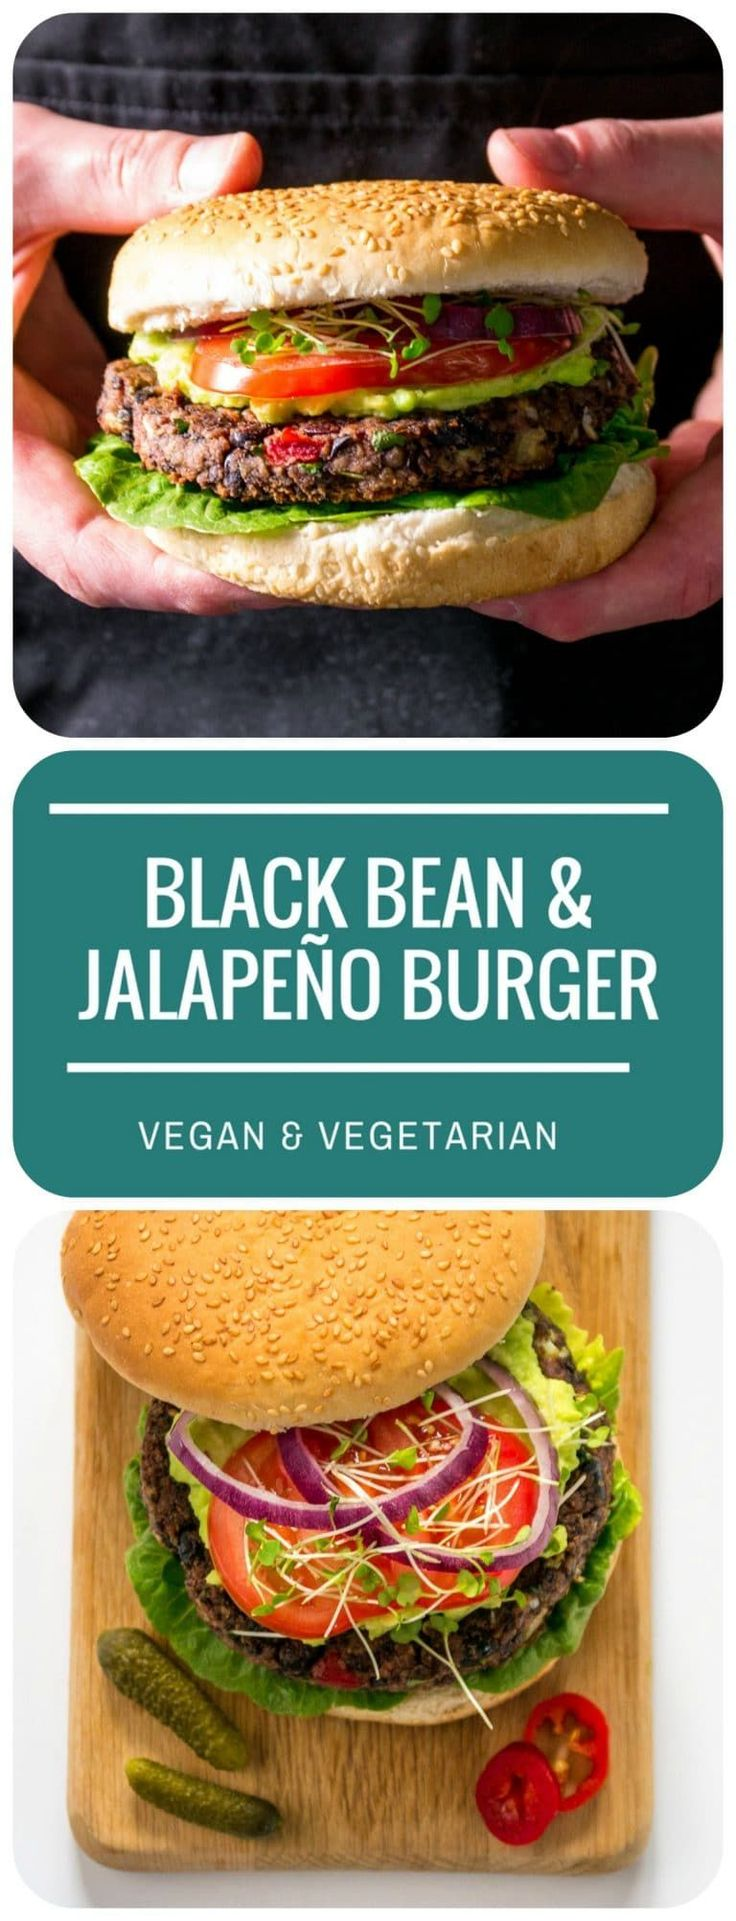 1127 best Best vegan grill images on Pinterest | Vegan meals, Eating ...